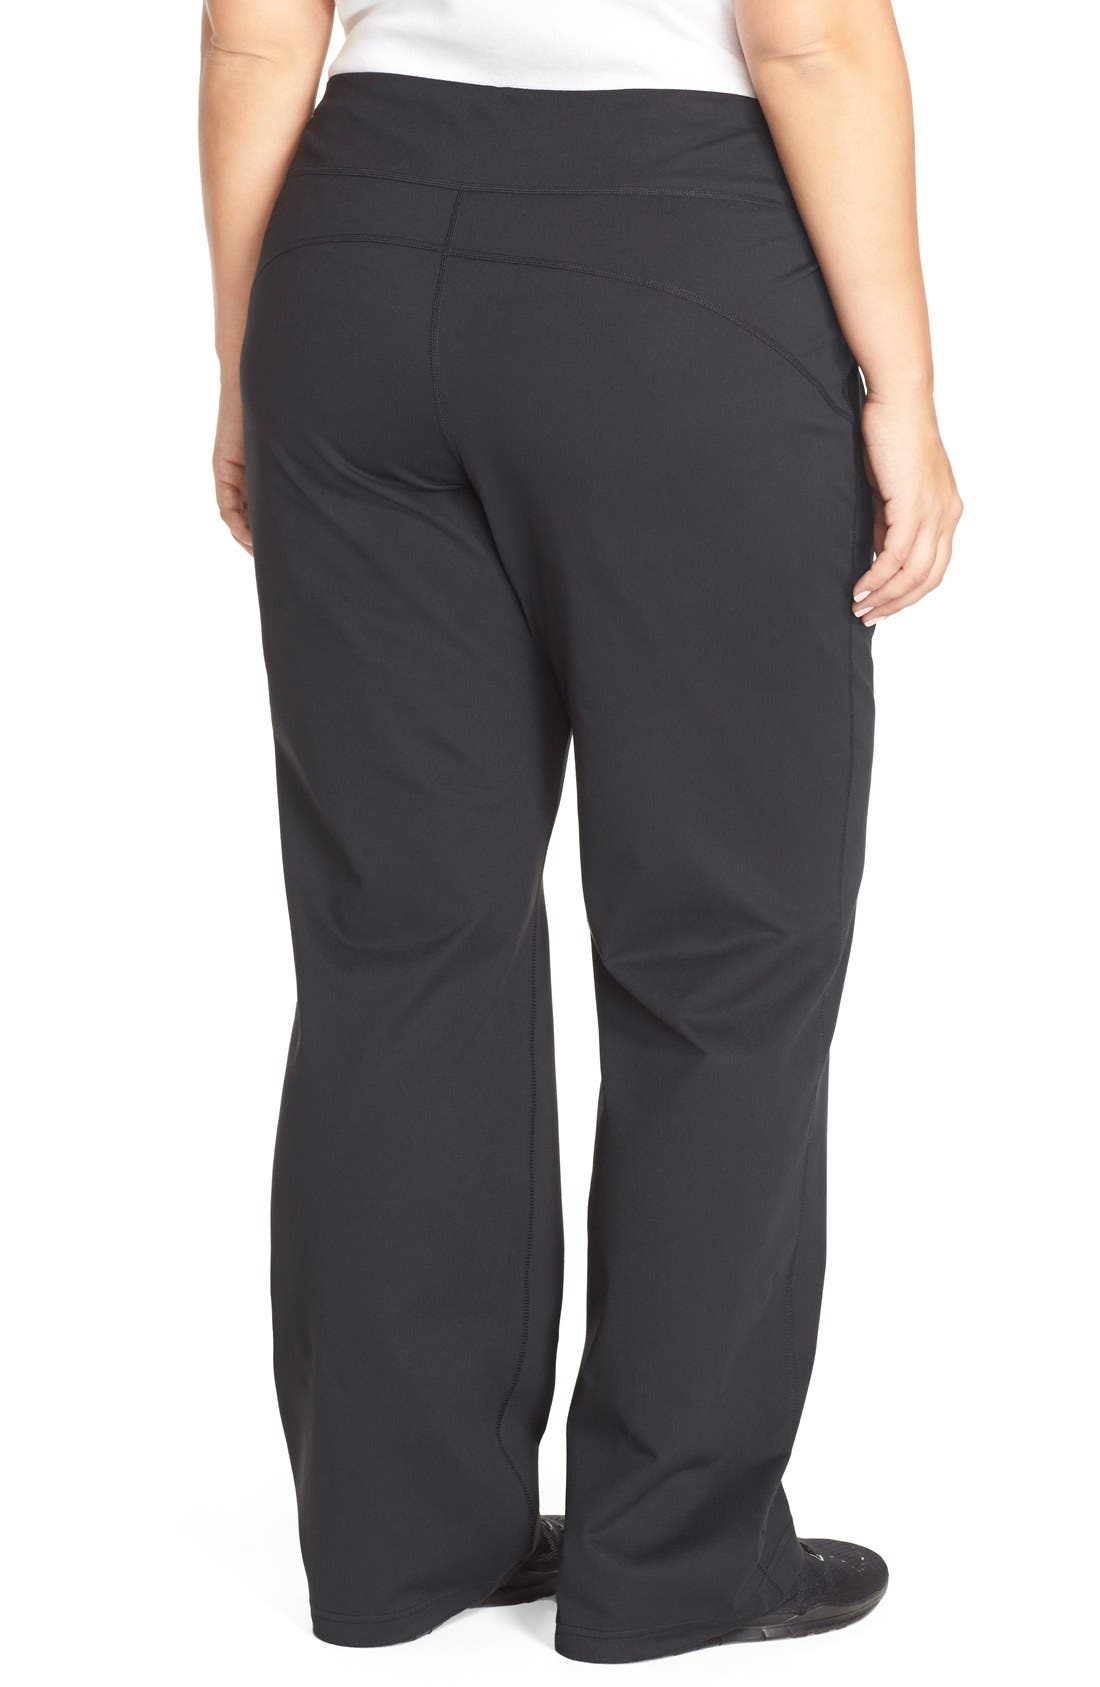 Alternate Image 2  - Zella 'Soul 3' Pants (Plus Size)